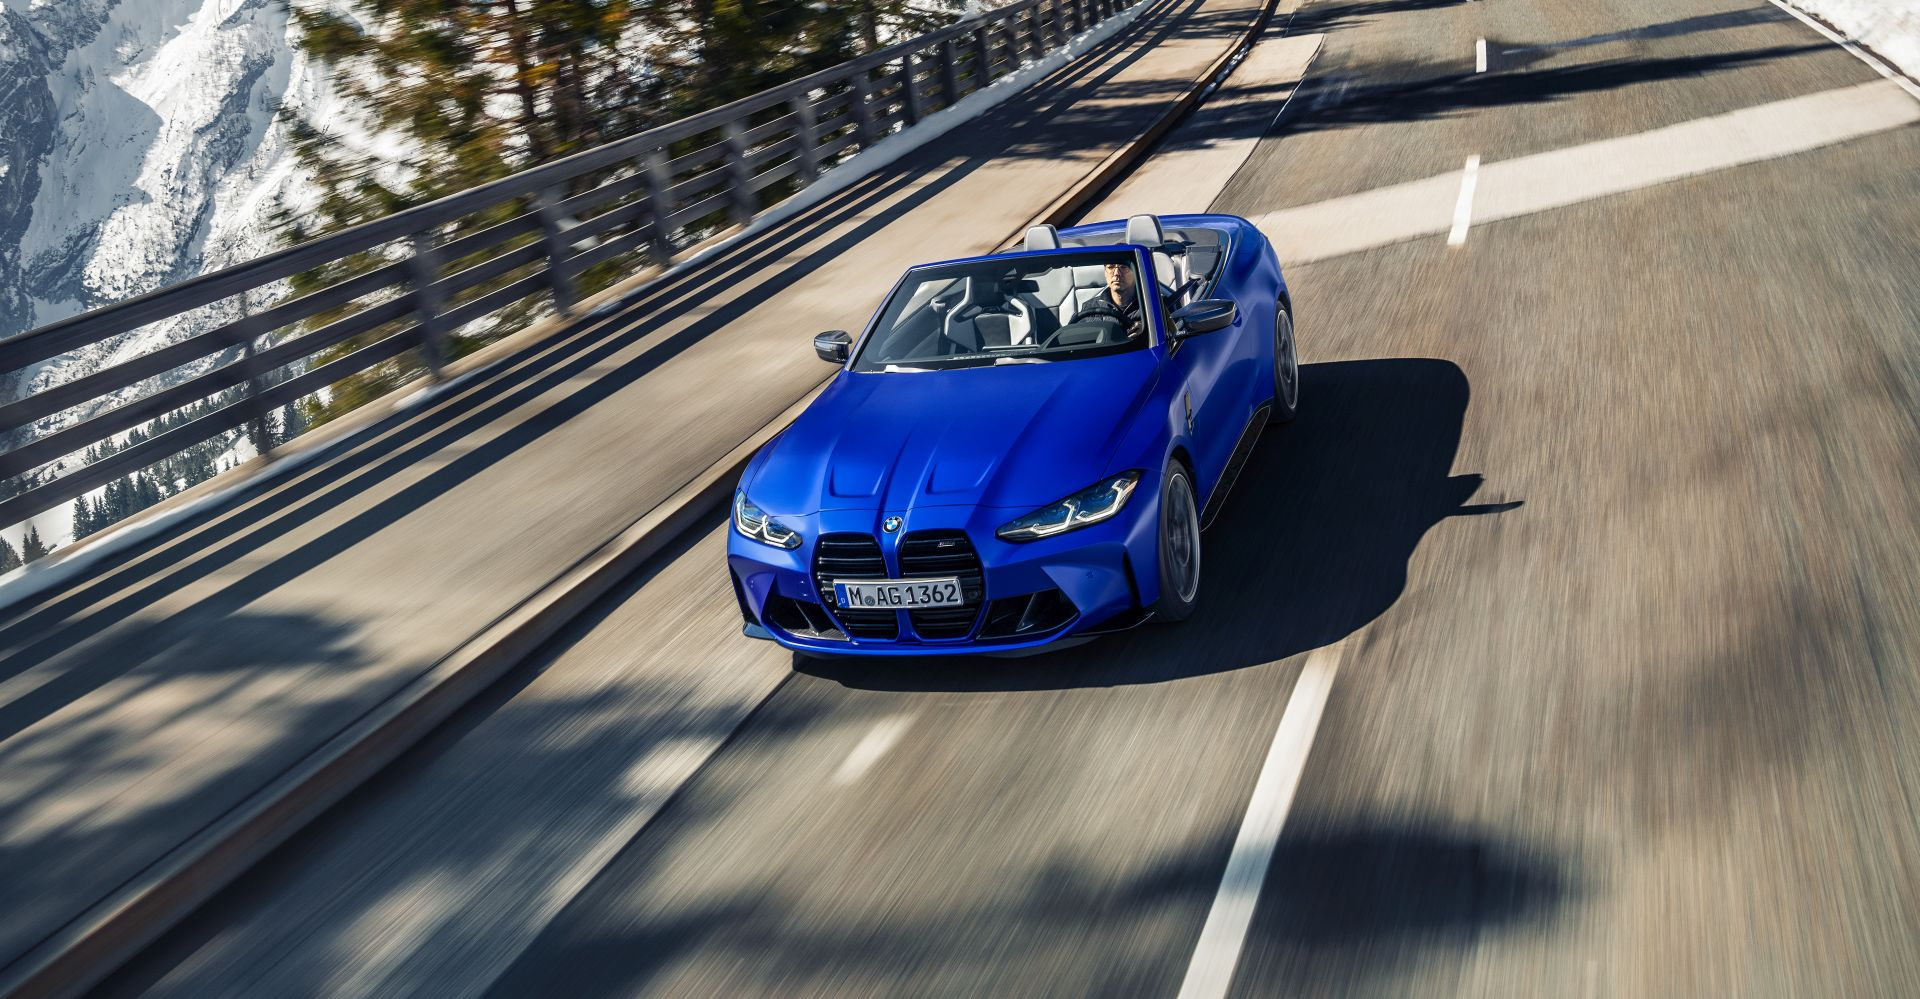 Spreman za ljeto – novi BMW M4 Competition Cabrio xDrive